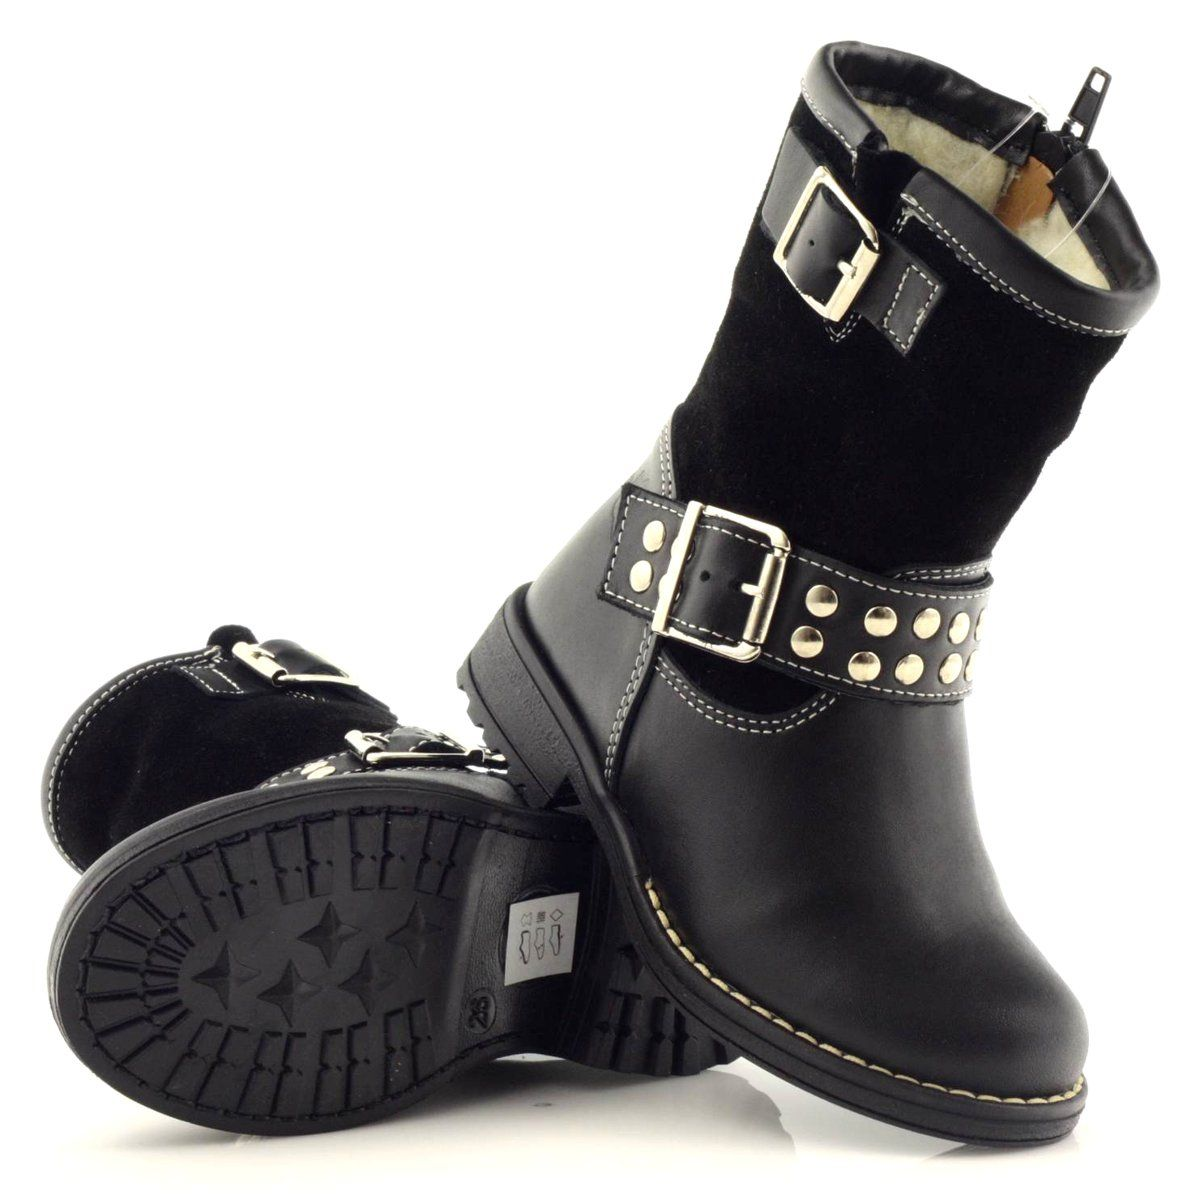 Kozaczki Dziewczece Ren But 3205 Czarne Girls Boots Boots Childrens Boots